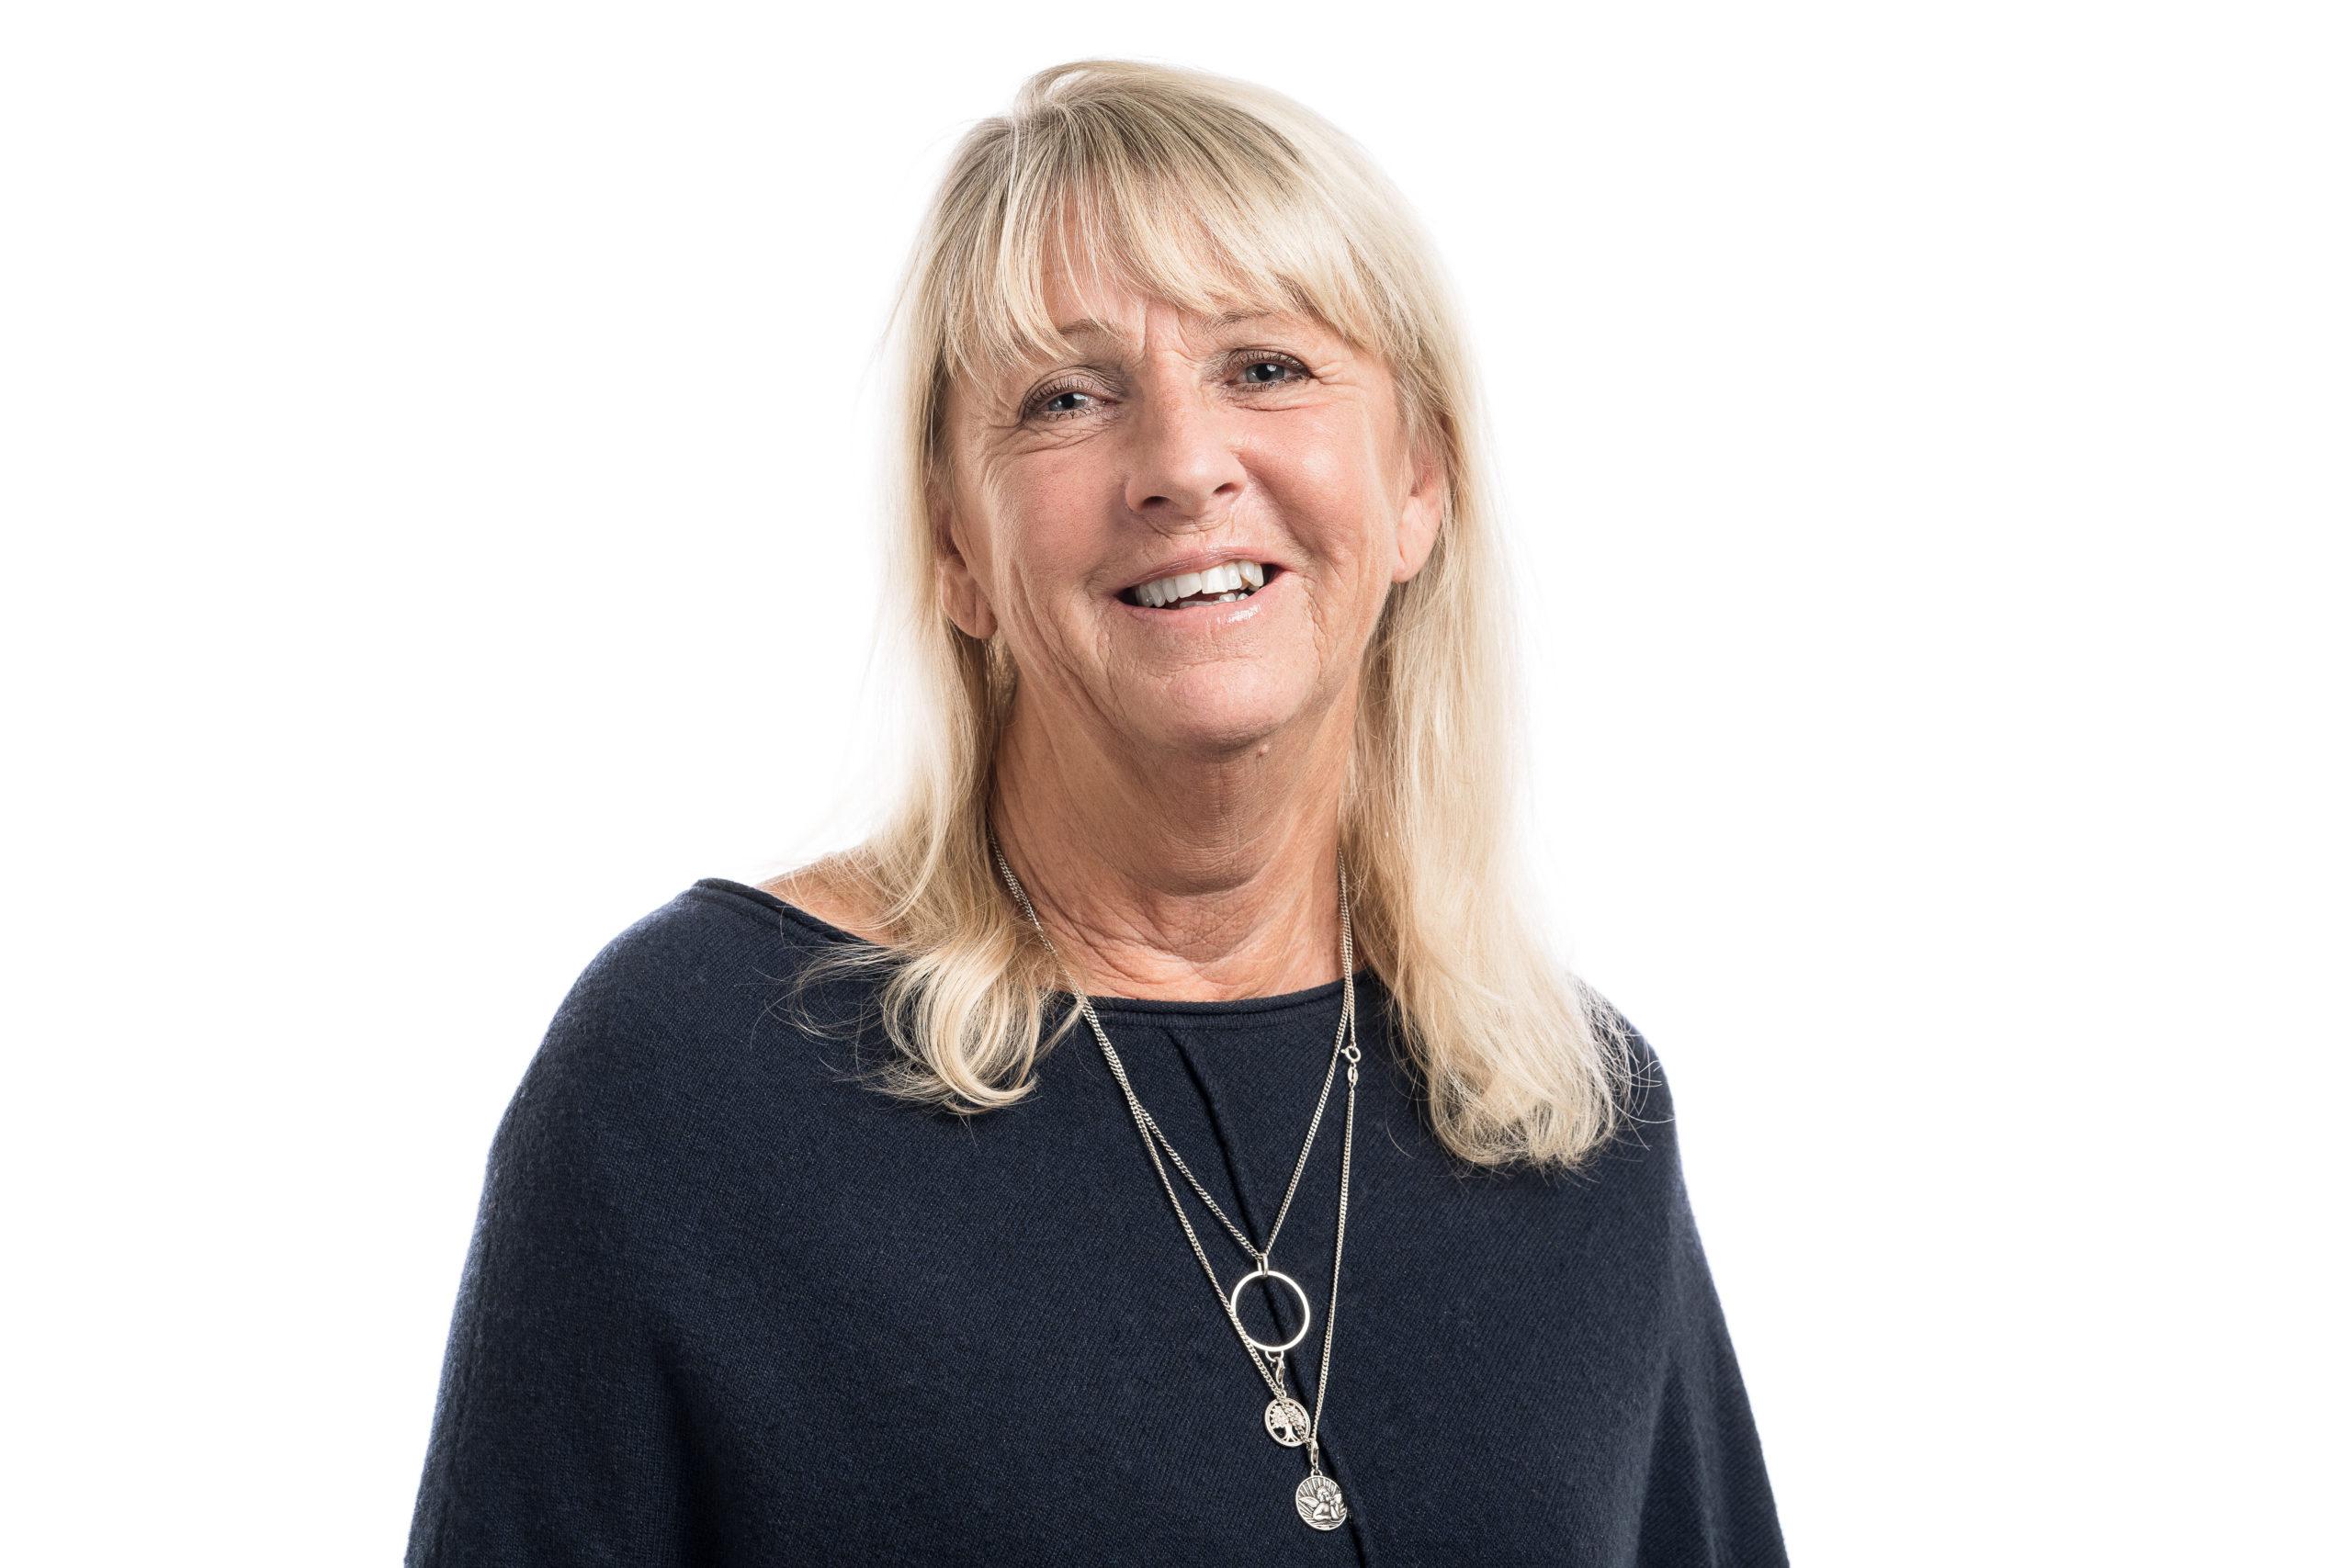 Pia Bergqvist, HR och säkerhetschef